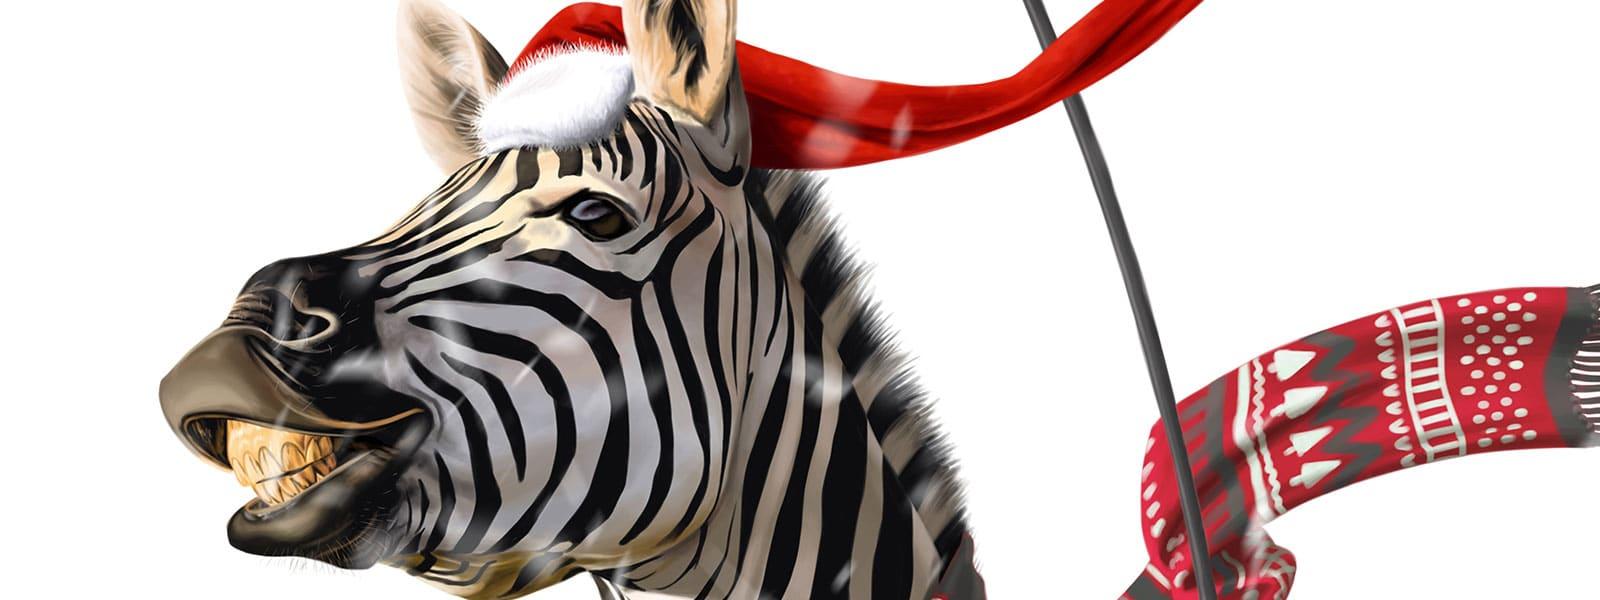 Zebra driver